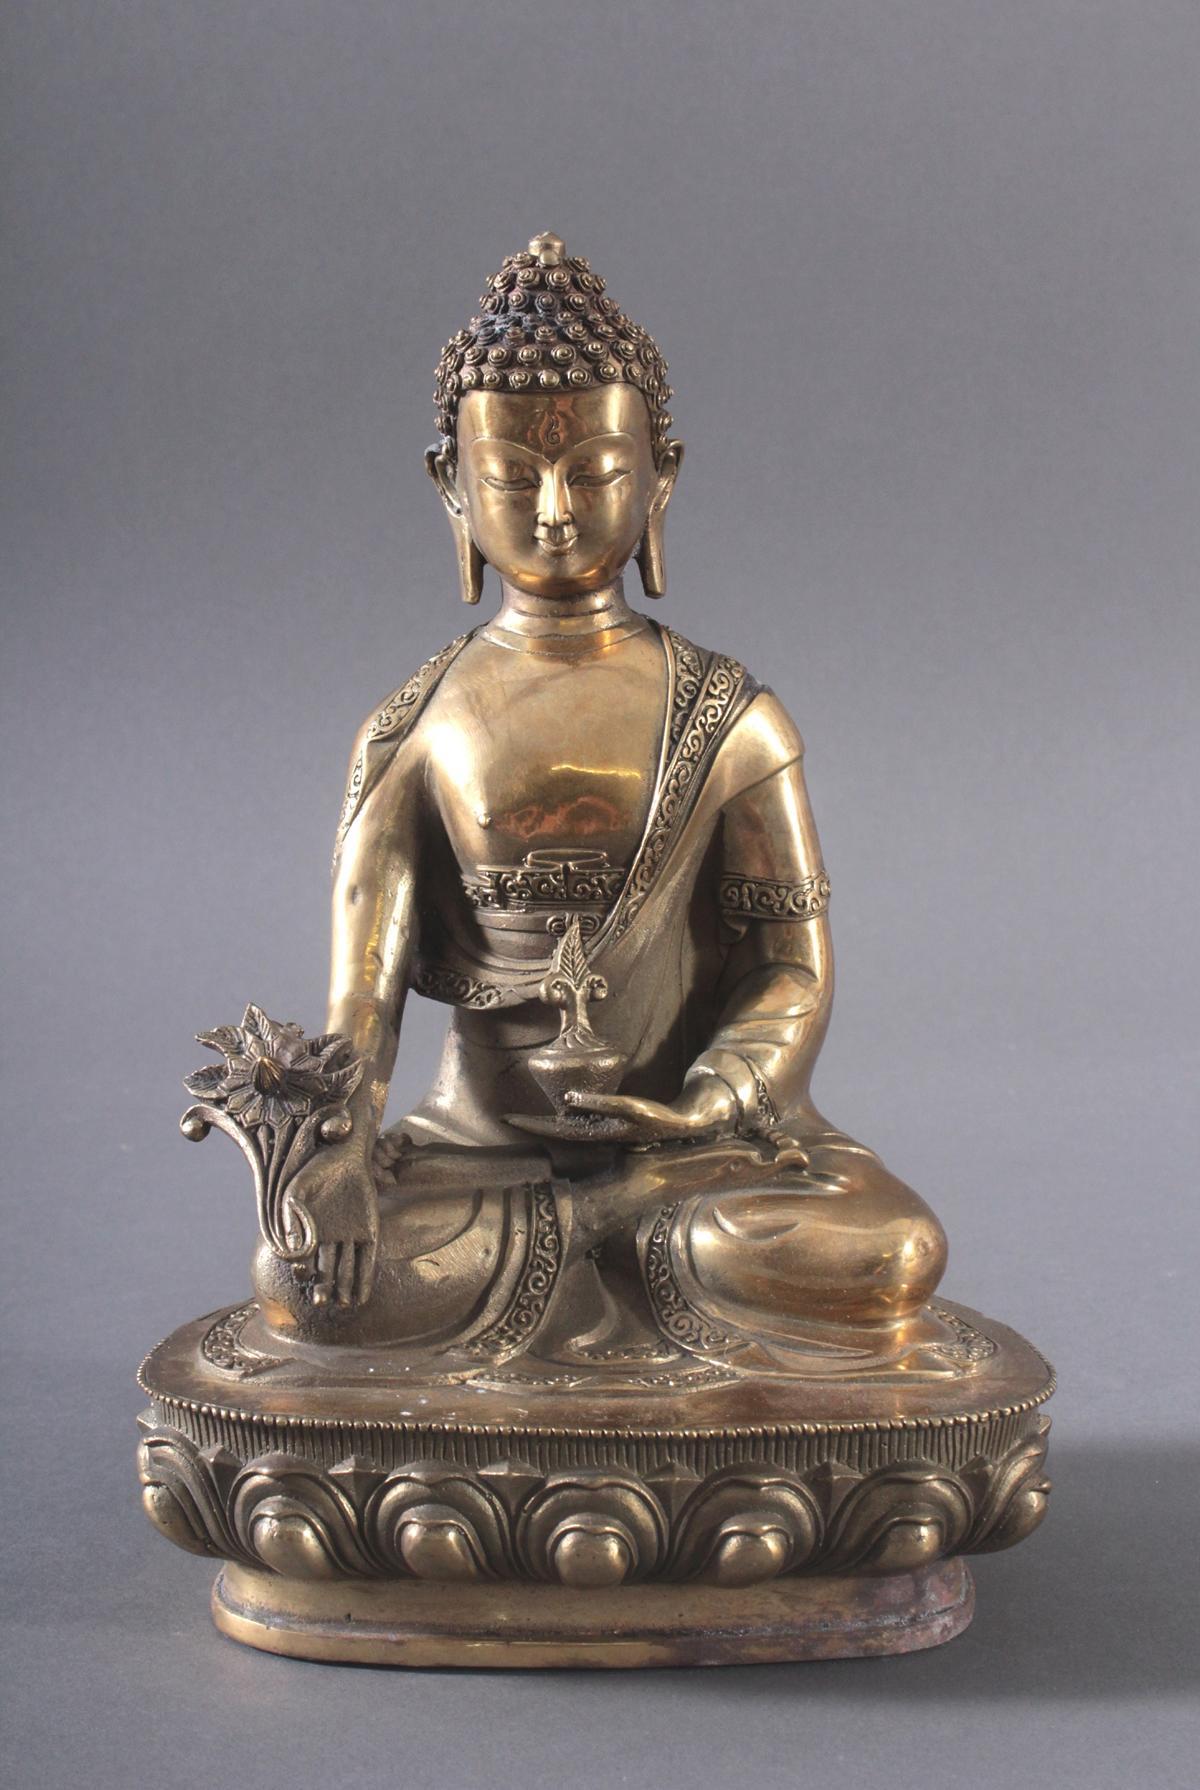 Medizin-Buddha, Indien, 20. Jh.